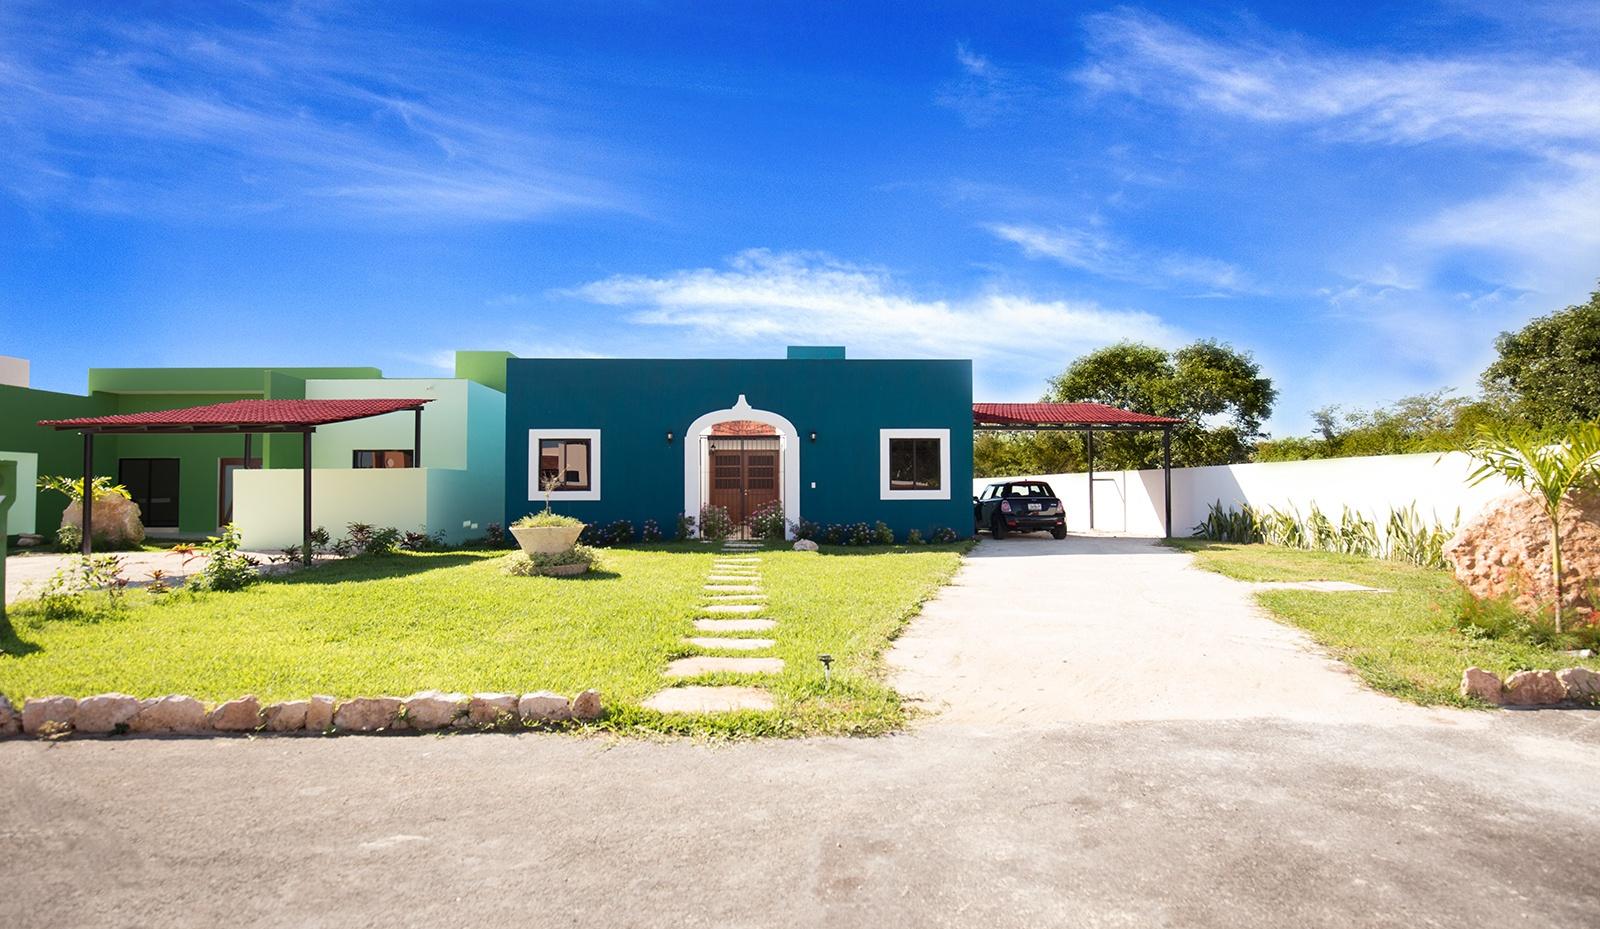 Casas en m rida residencial baspul for Modelo de casa quinta en paraguay